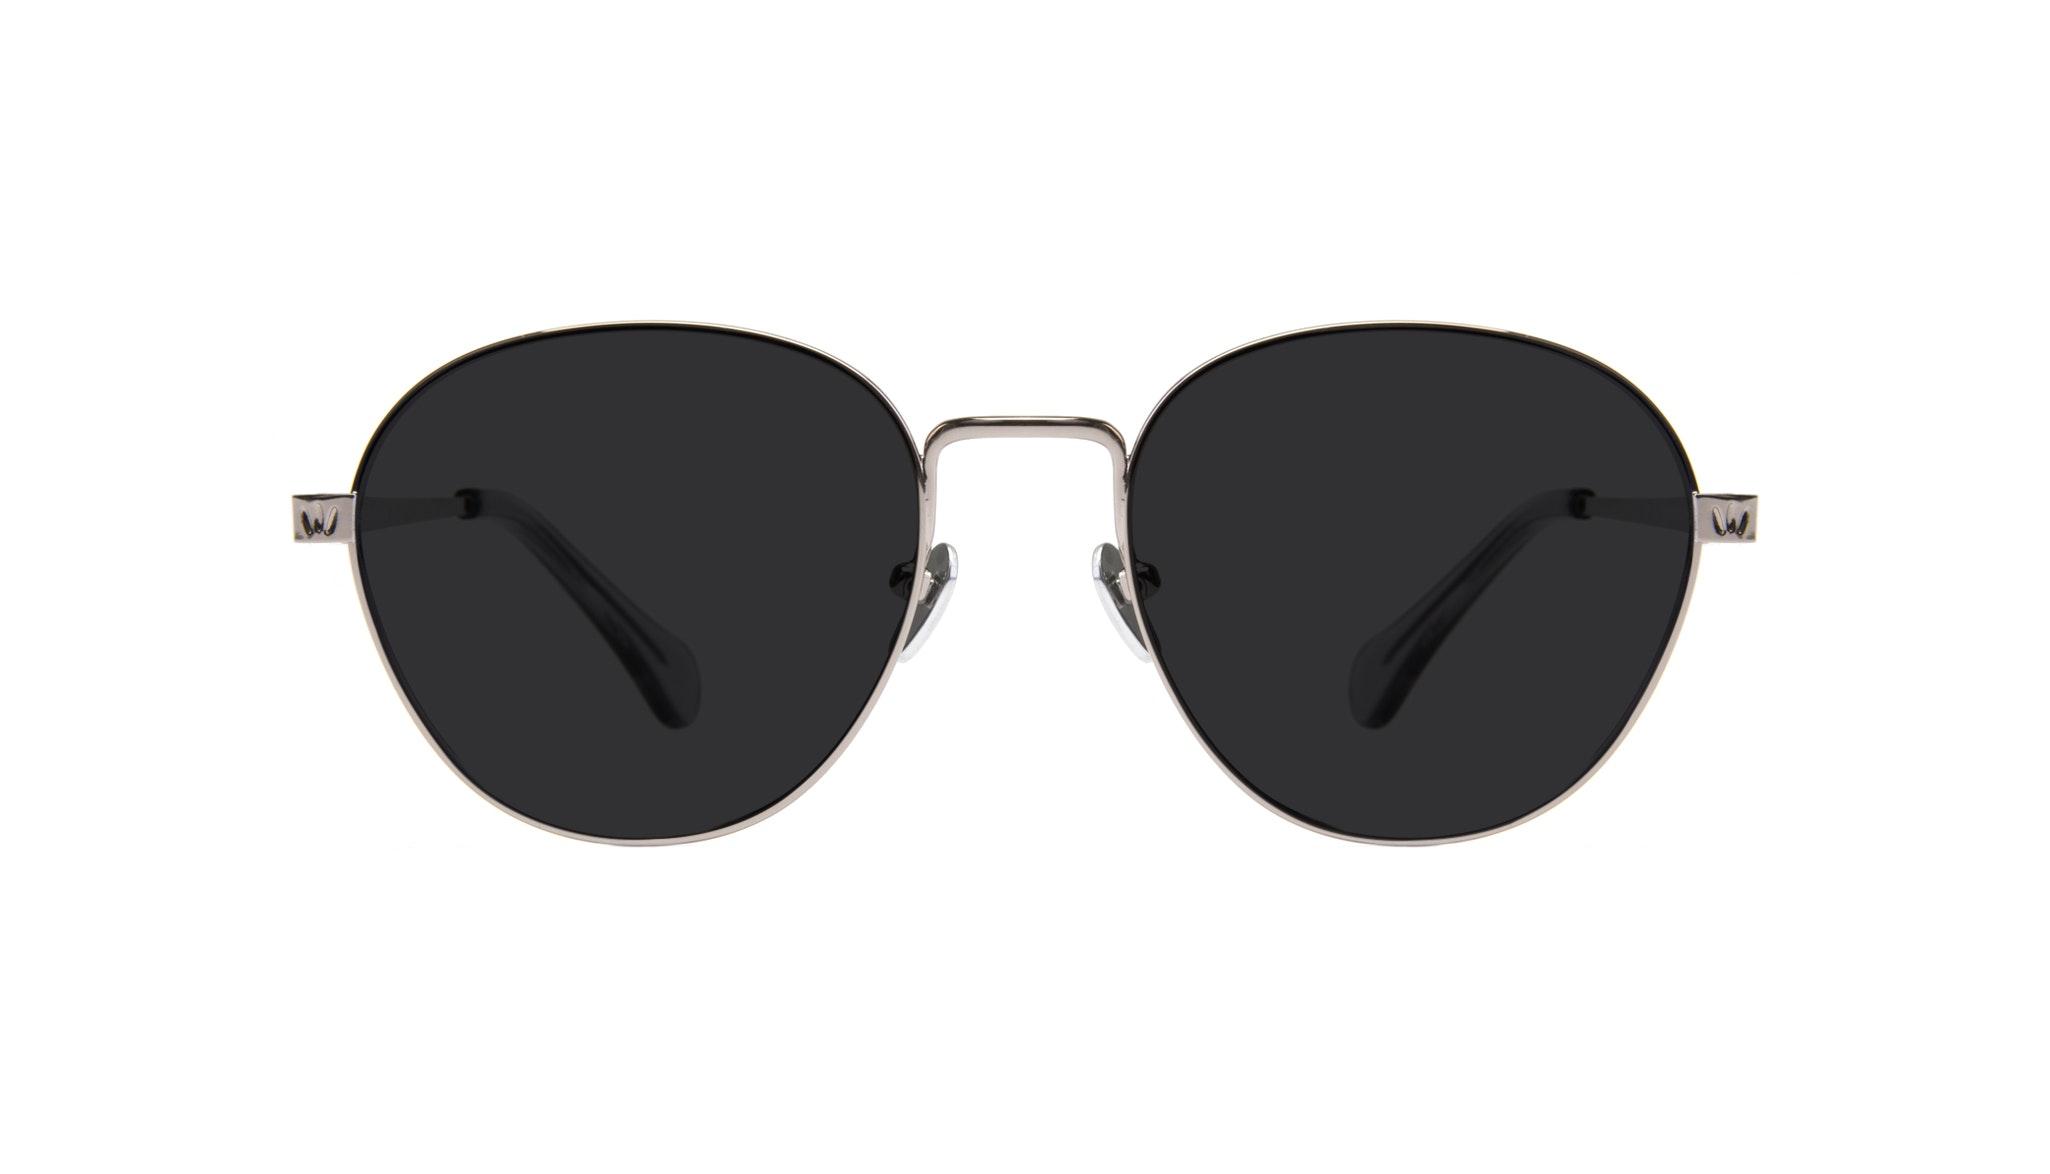 Affordable Fashion Glasses Round Sunglasses Women Brace Silver